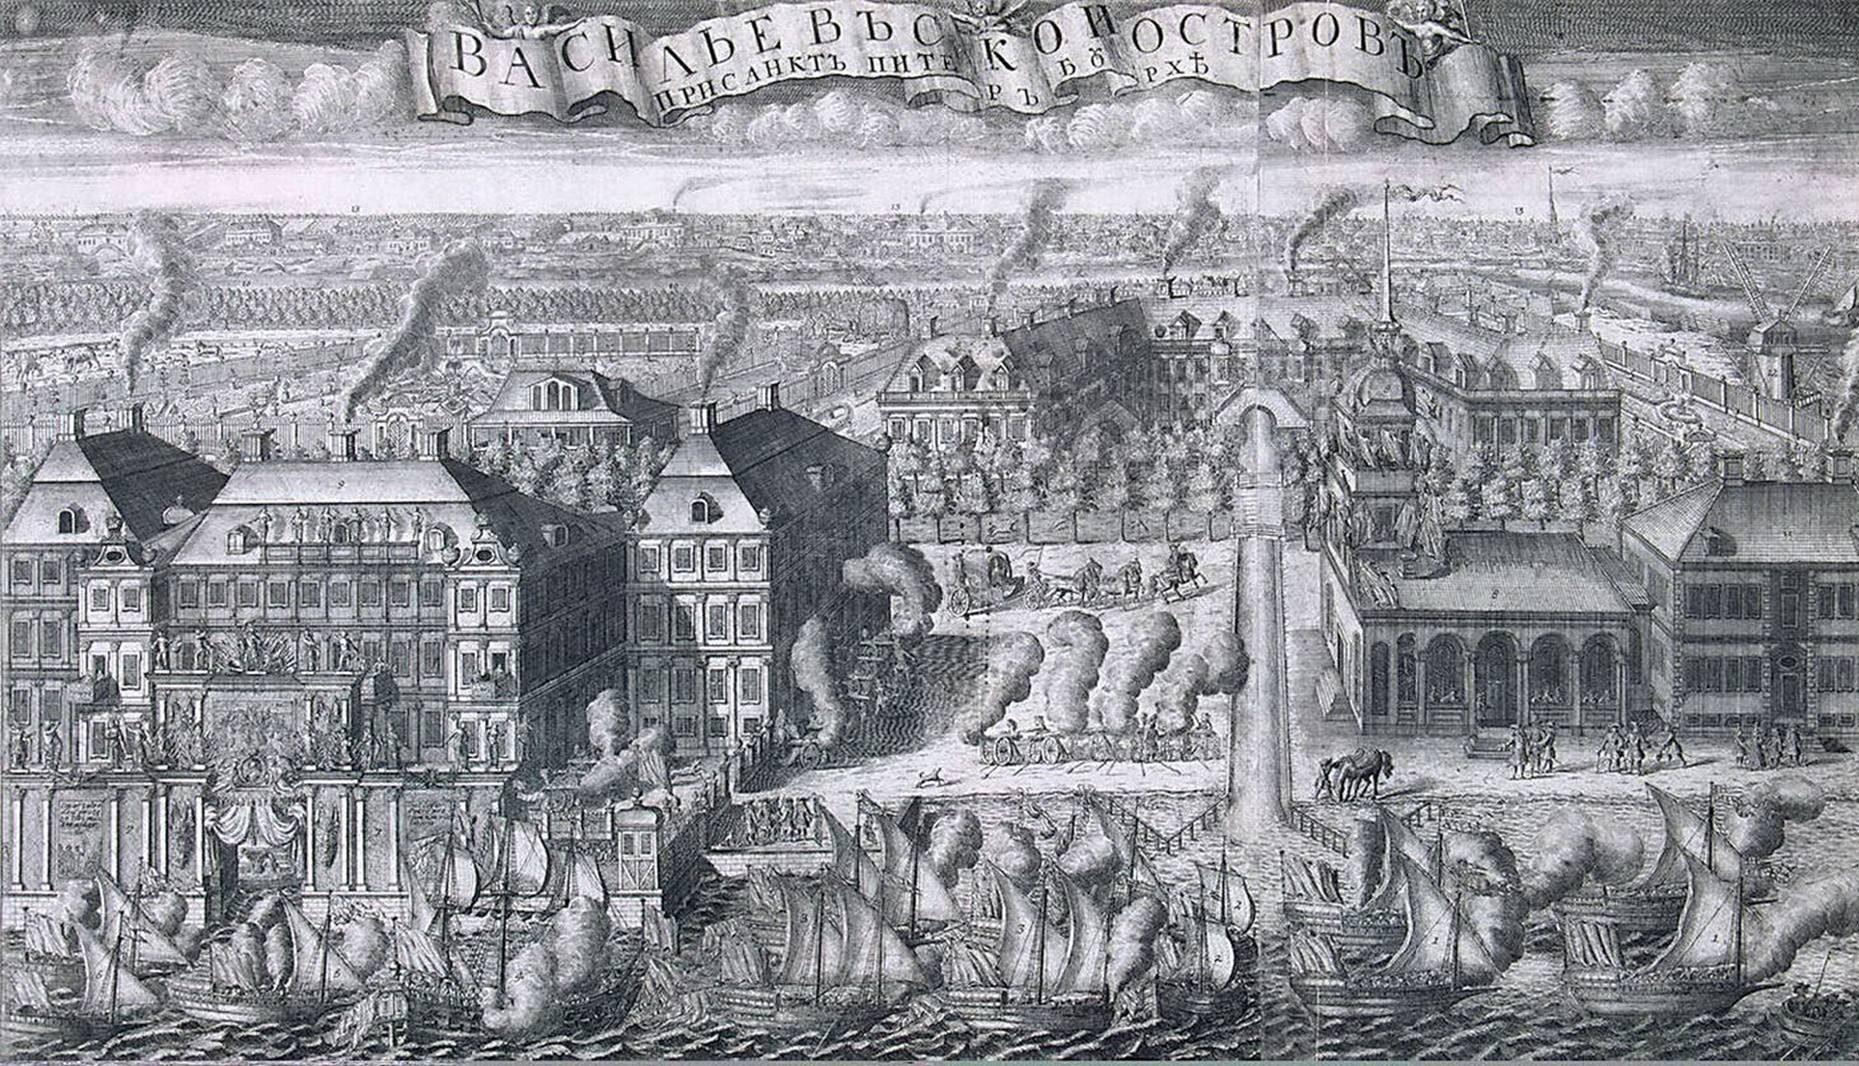 Меншиковский дворец на гравюре А. Зубова 1716 года